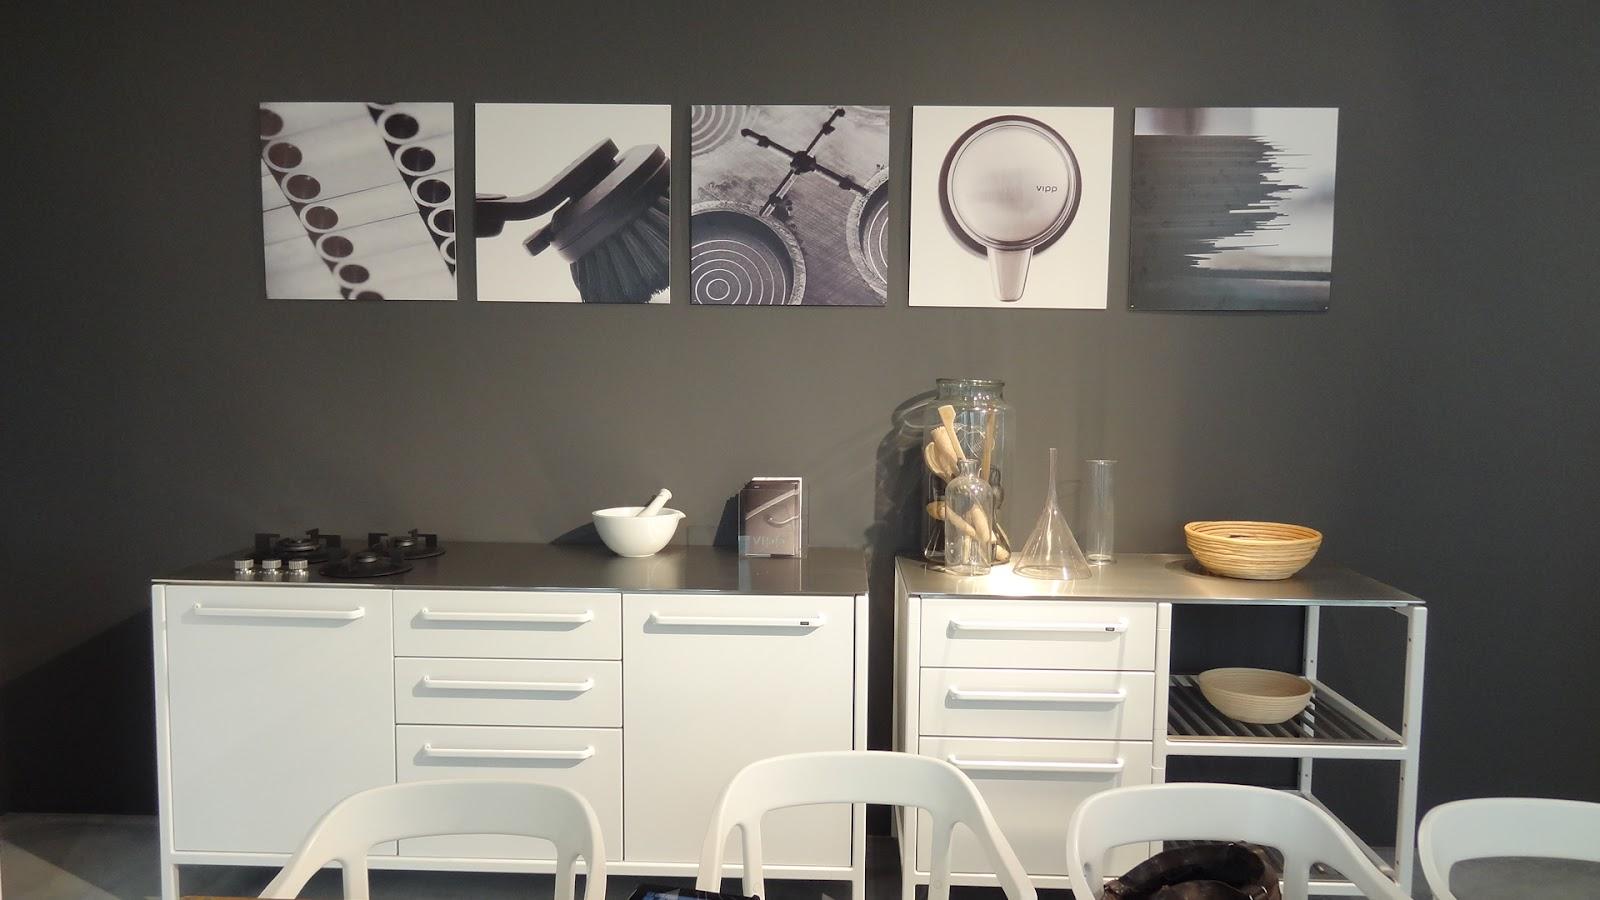 Ikea Modulaire Keuken : Bank ikea ervaring ikea windscherm with ikea windscherm